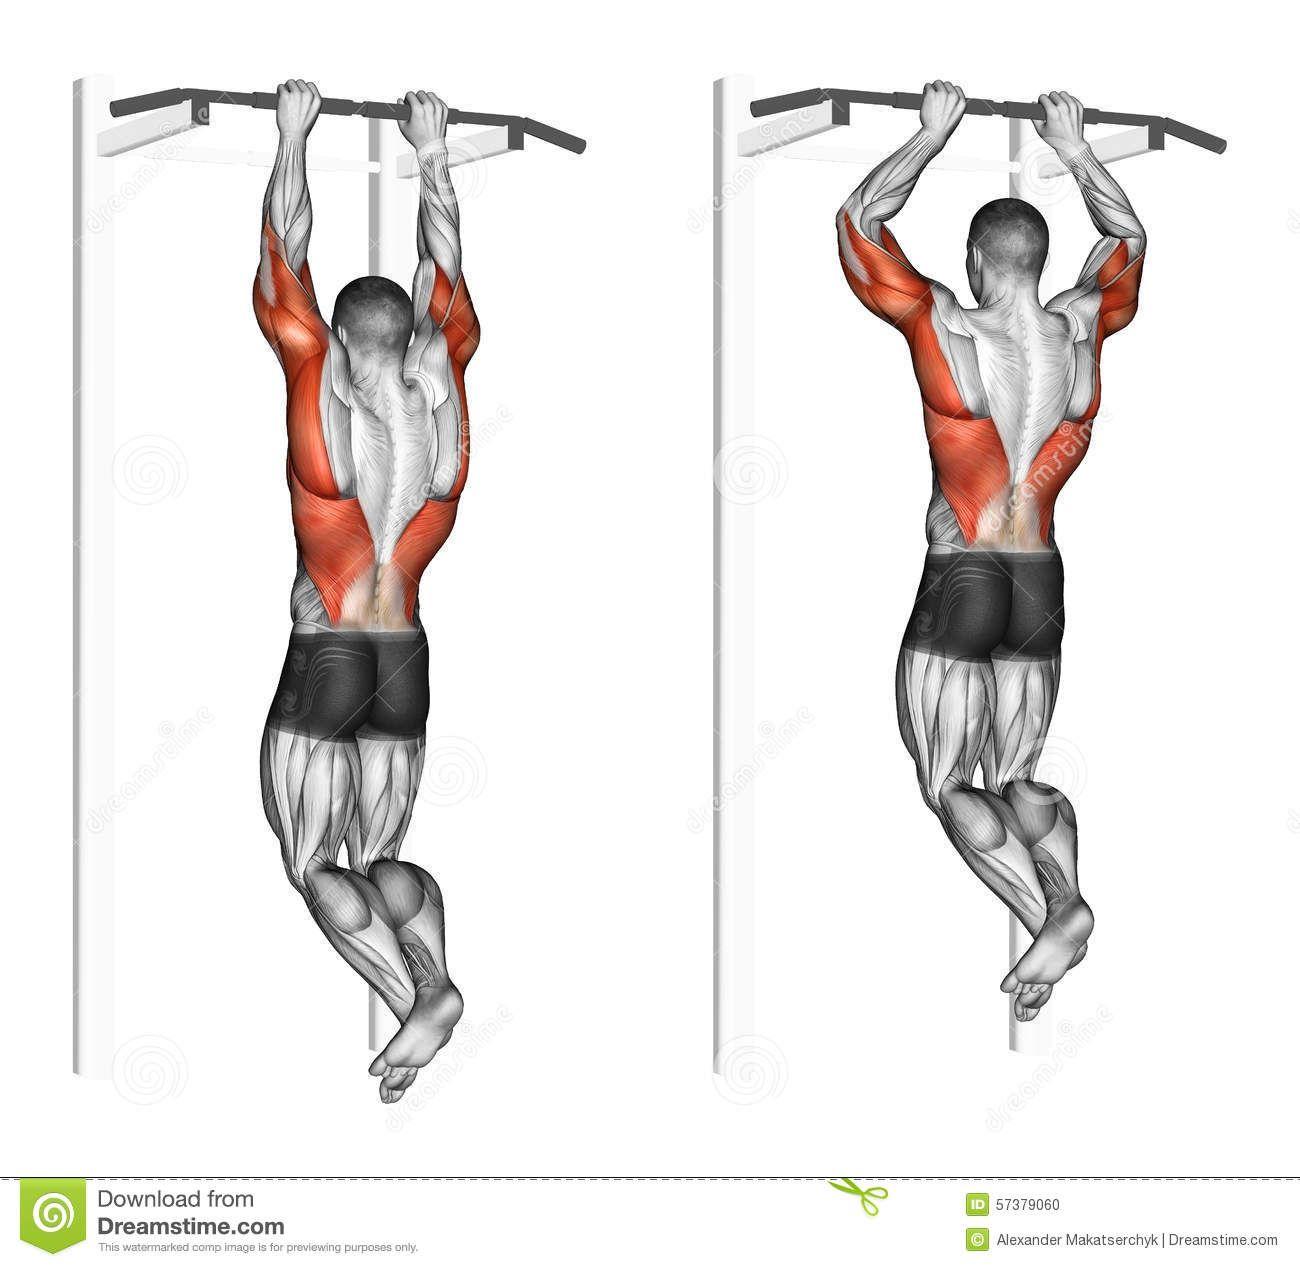 exercising-pull-ups-brachialis-bodybuilding-target-muscles ...